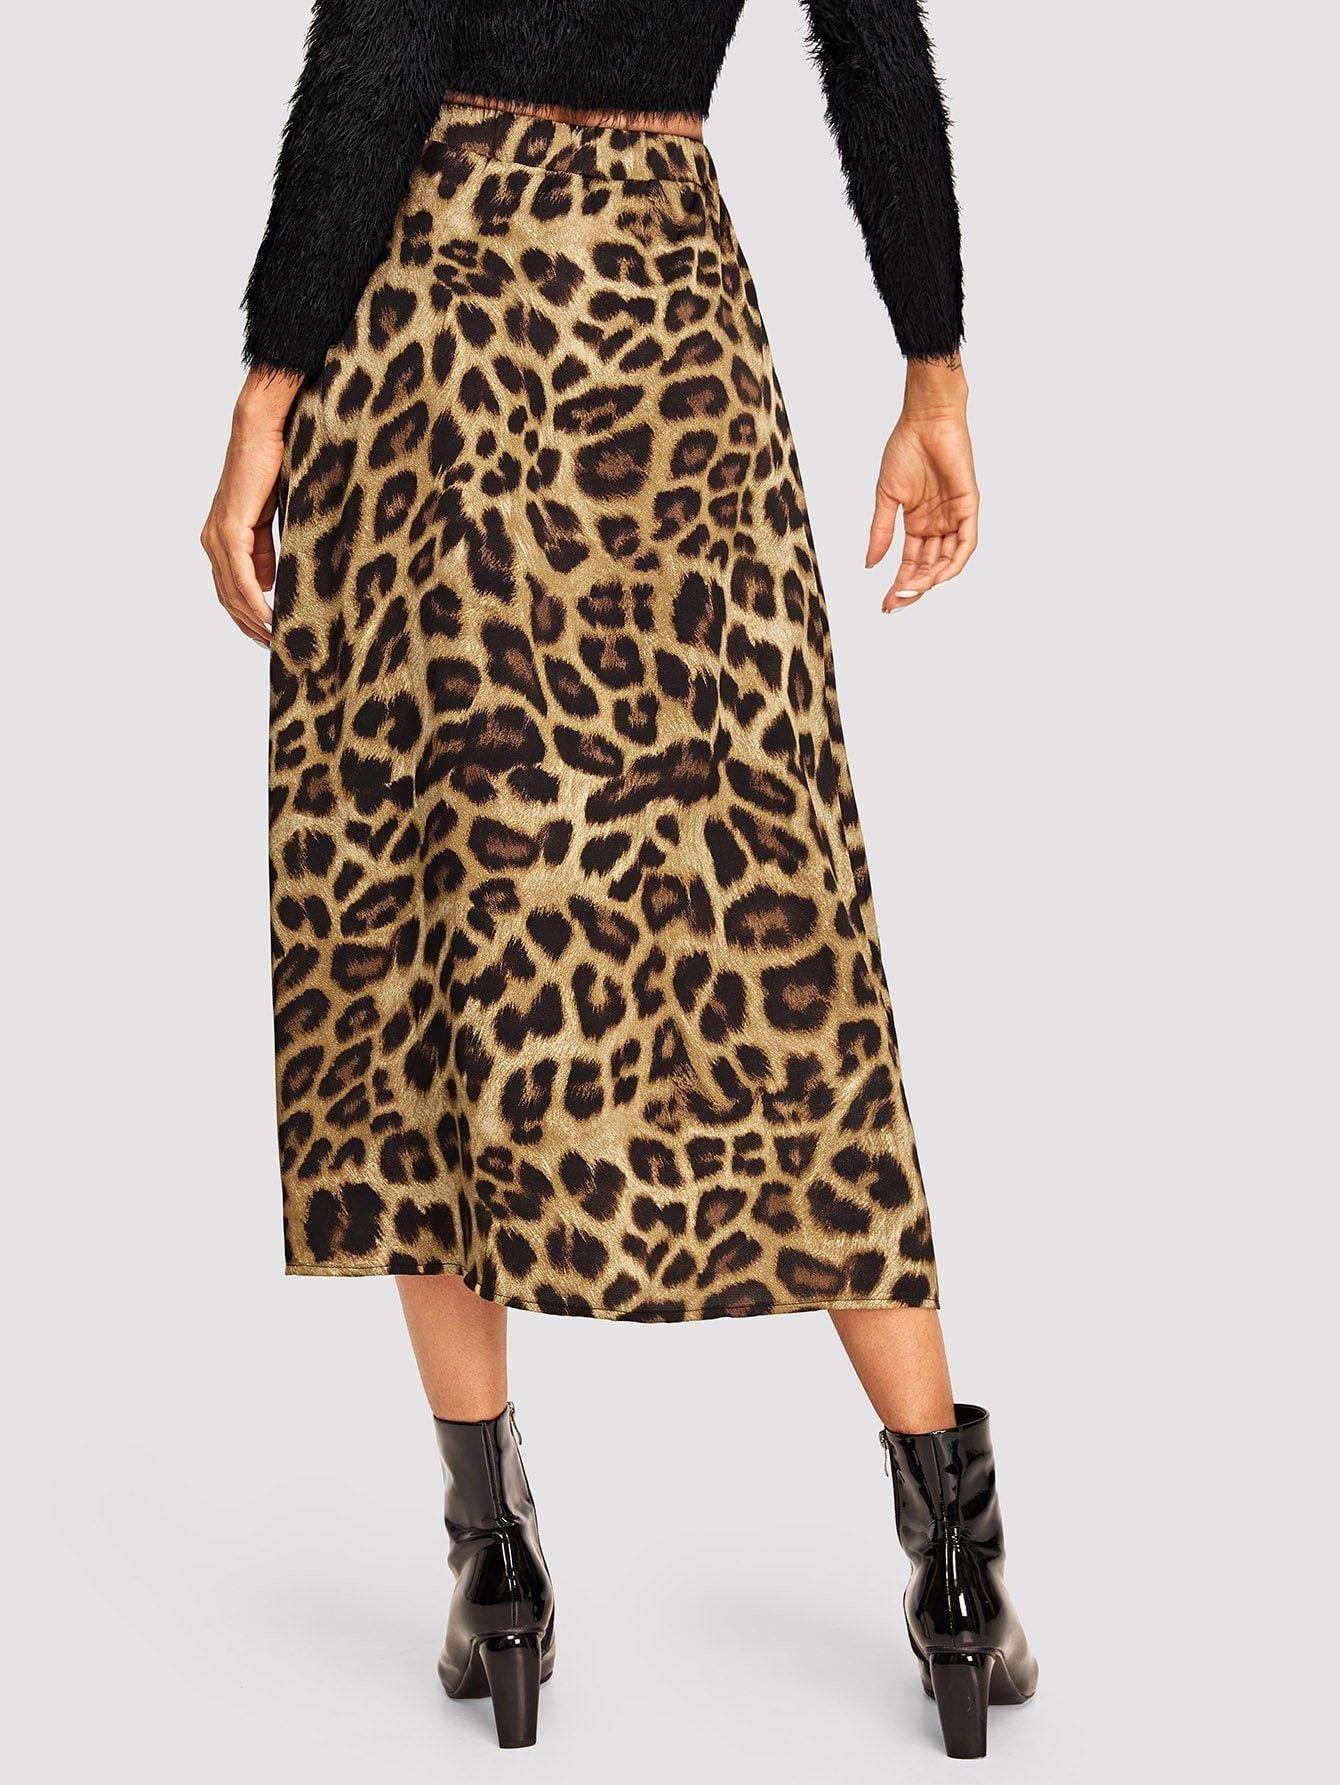 ab1ecf9b3c7915 Elastic Waist Leopard Print Skirt Waist#Elastic#Leopard Leopard Print Skirt,  Women's Skirts